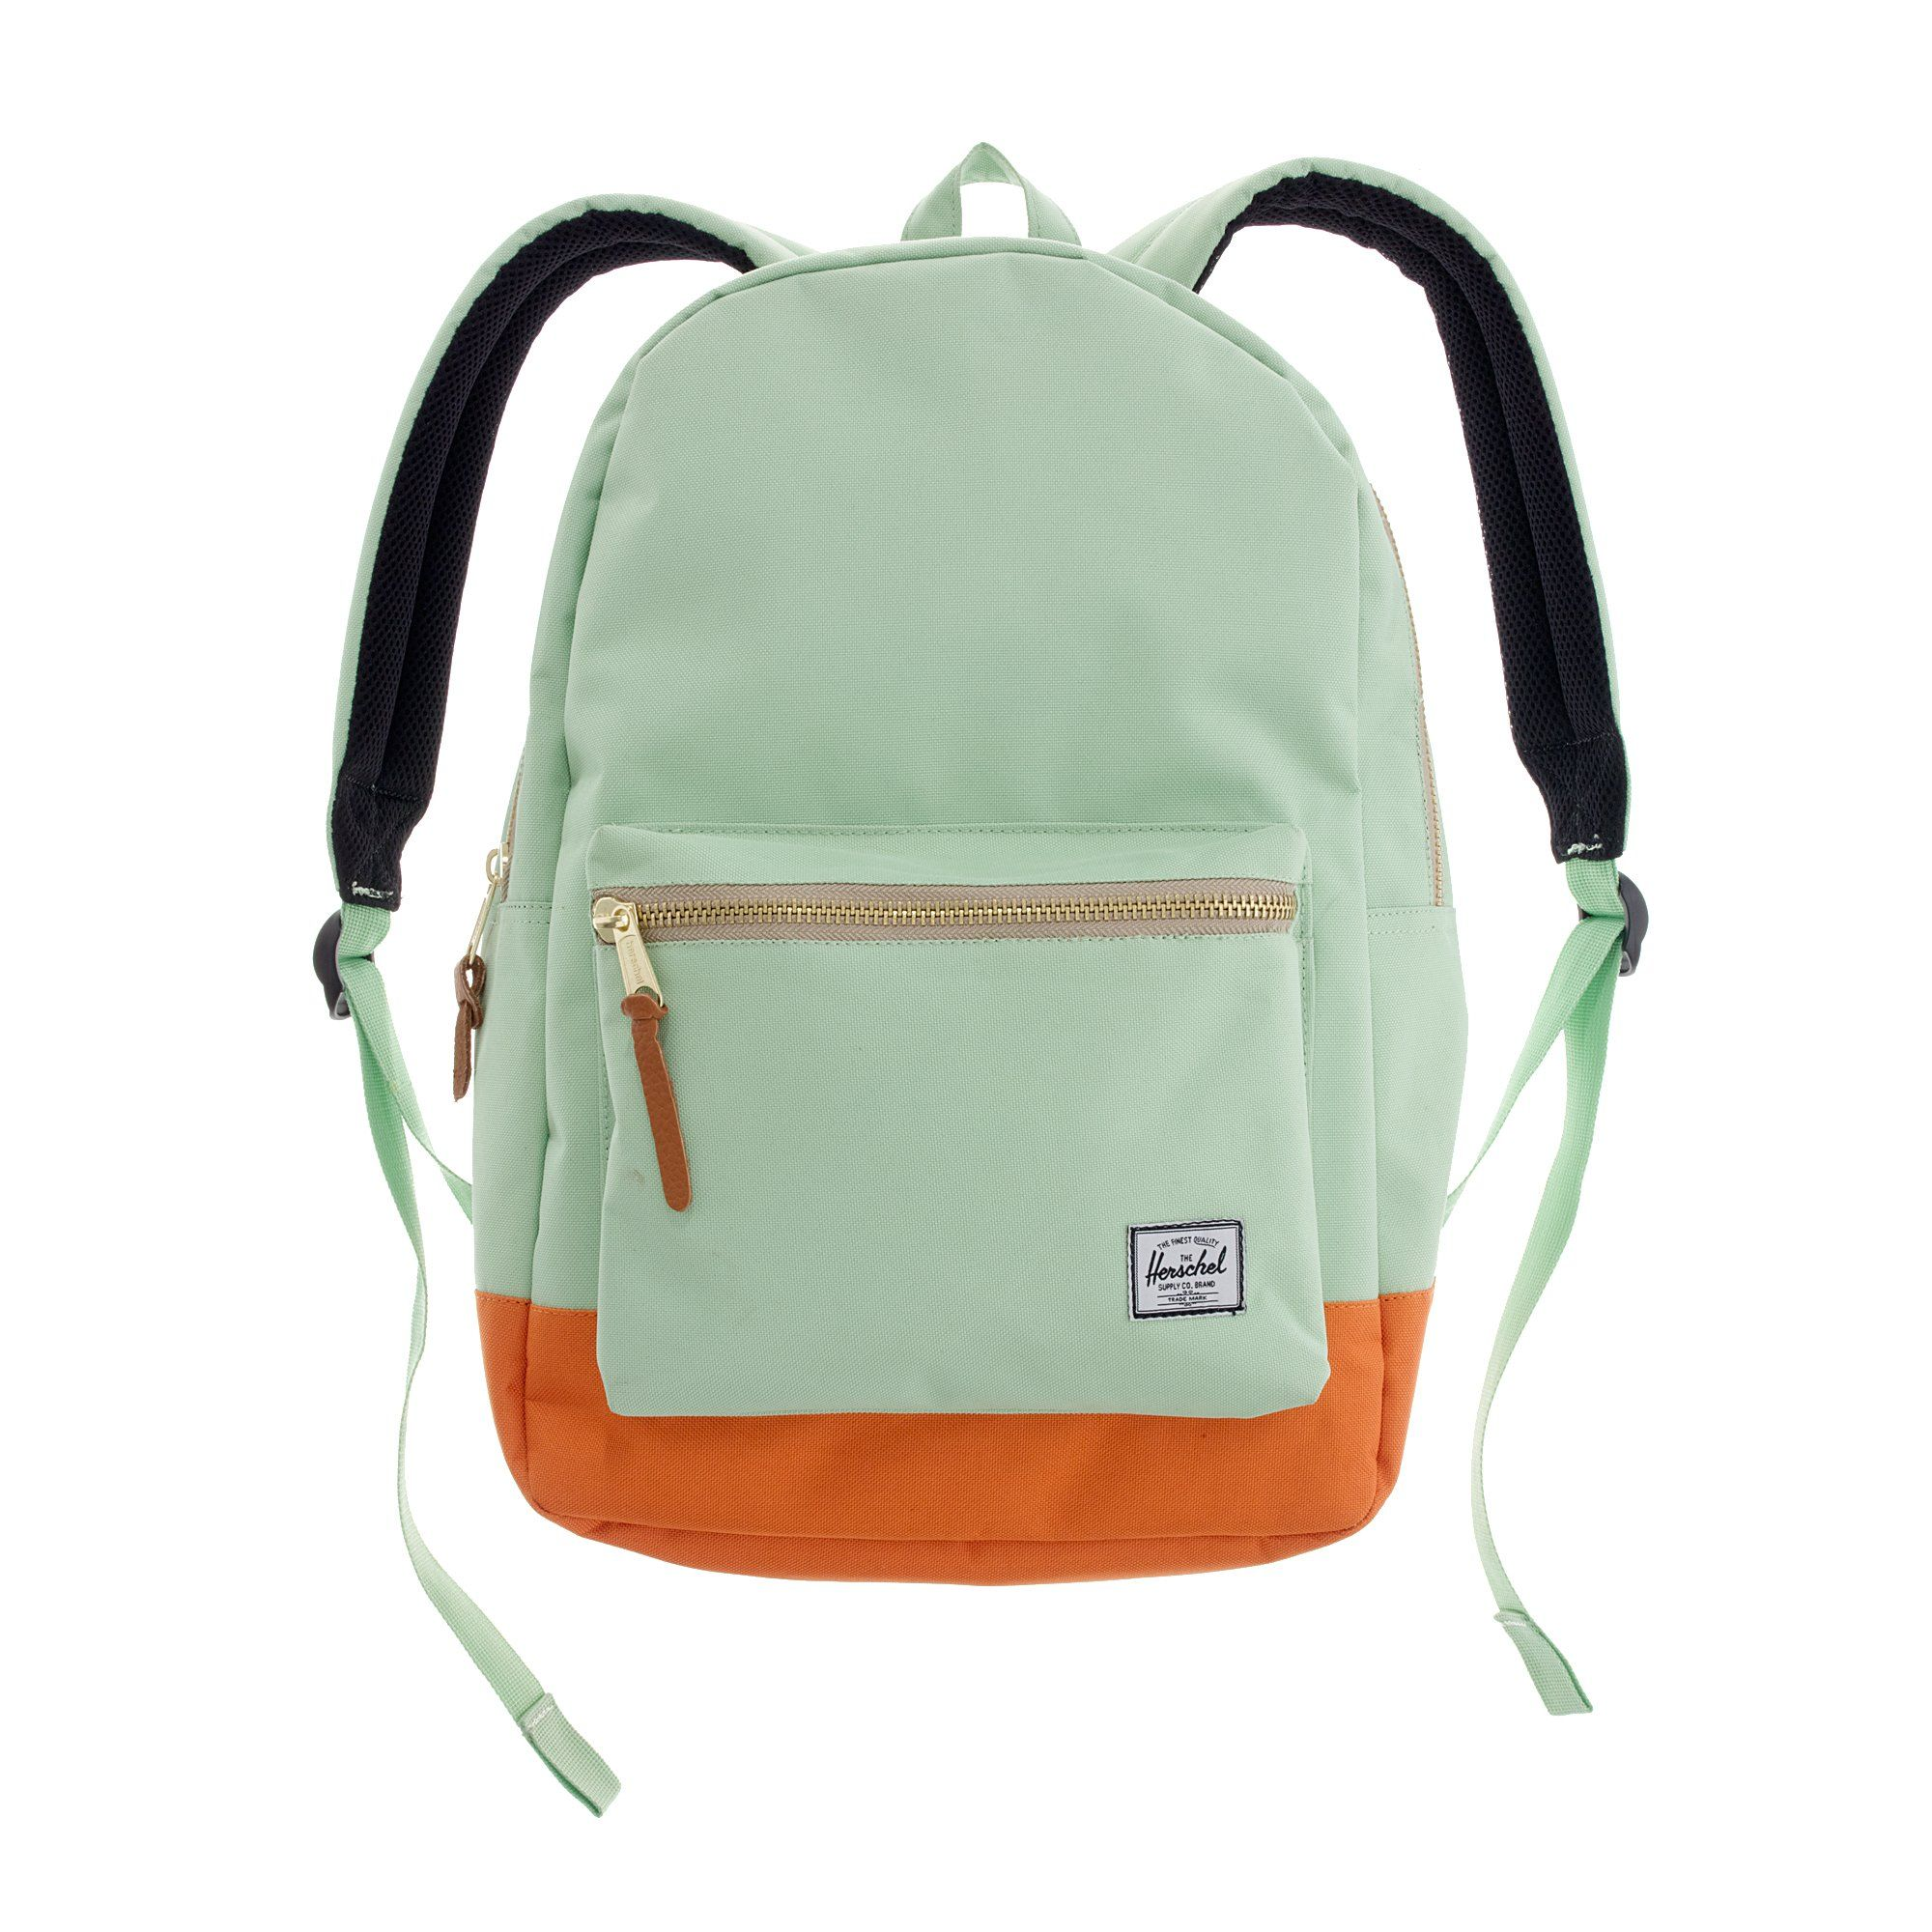 cf71acbfd0 Herschel Supply Co. Herschel Supply Company® Twotone Settlement Backpack in  Green (mint orange bottom)